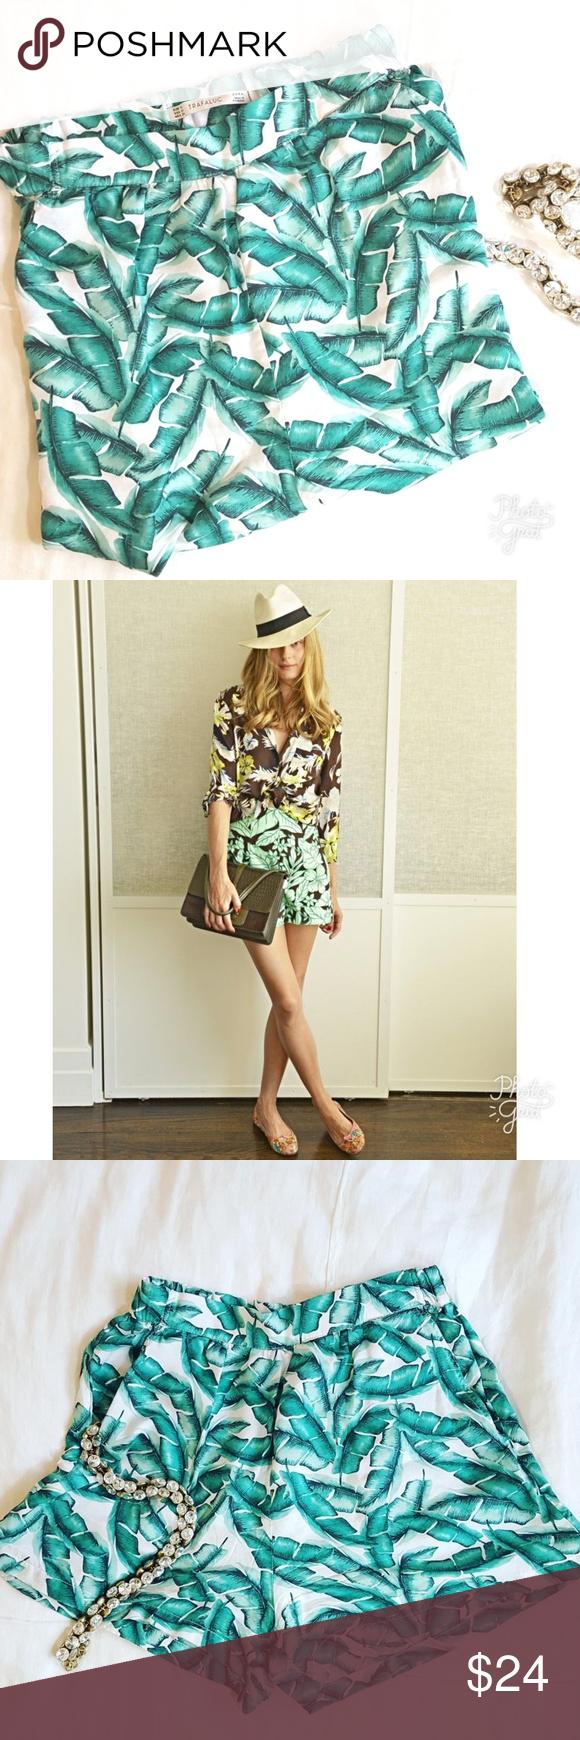 e3a0a759 ZARA TRF | Palm Leaf Shorts ~ Zara Trafaluc ~ Print: Palm Leaf / Banana